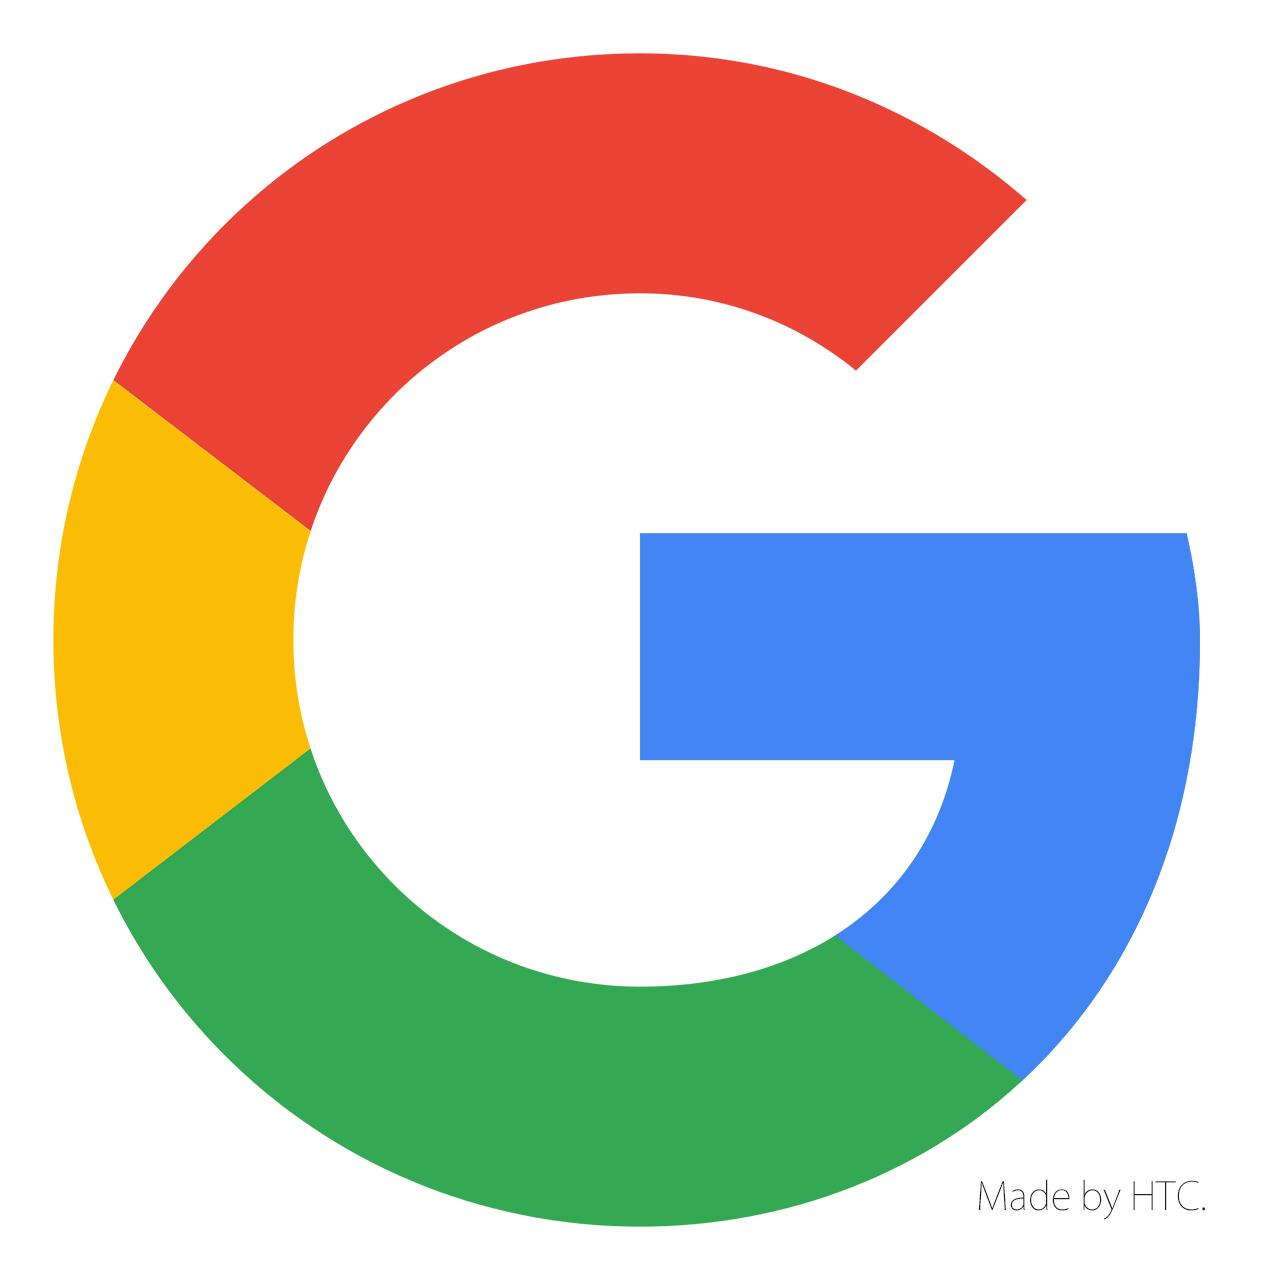 htc_google_pixel